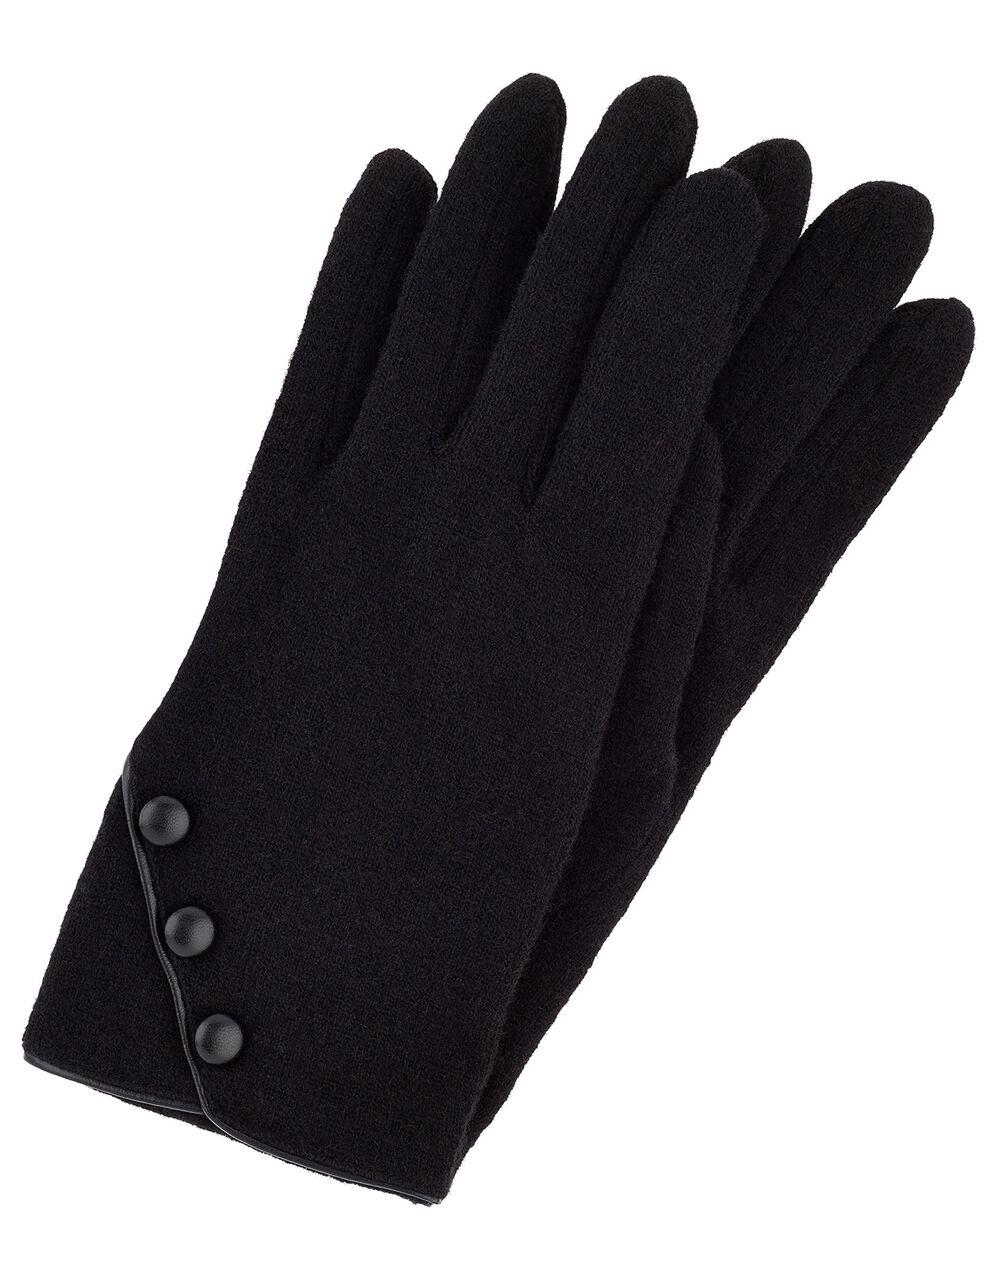 Button Cuff Gloves in Wool Blend, Black (BLACK), large